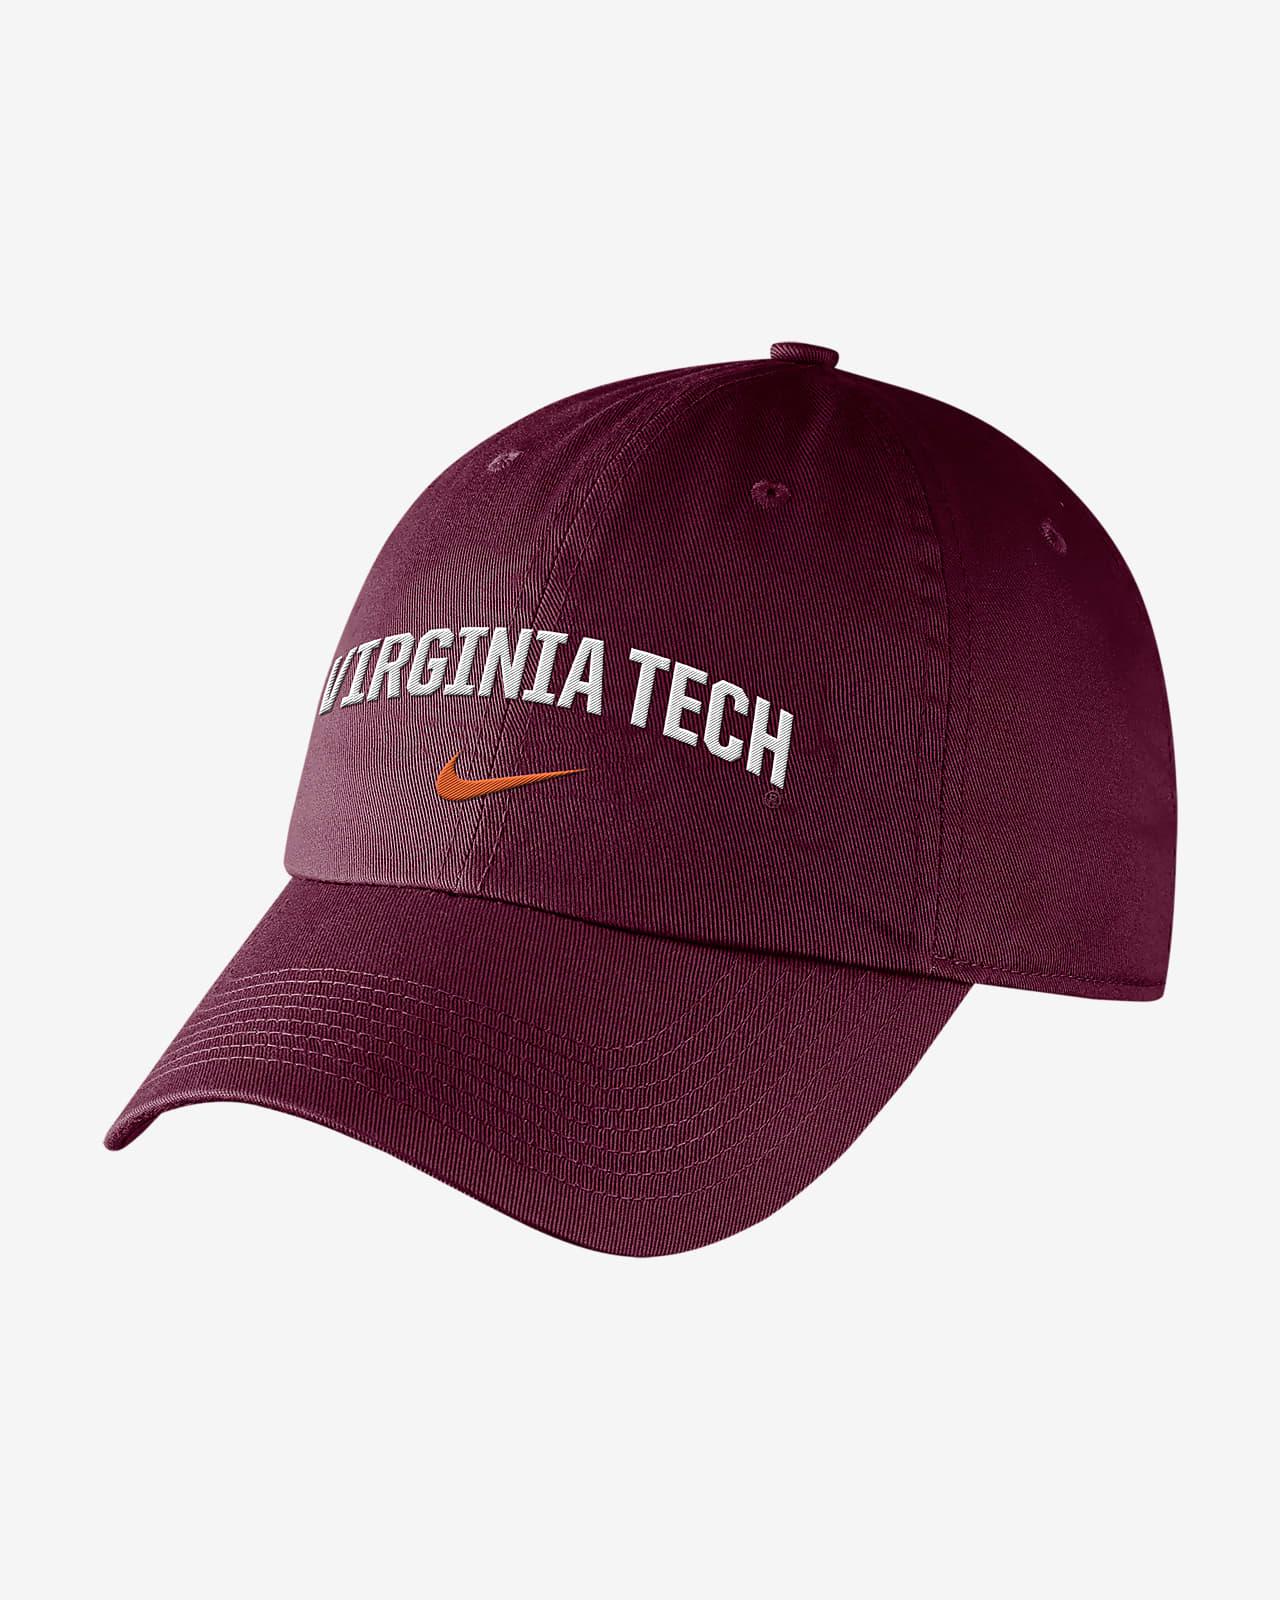 Nike College (Virginia Tech) Hat